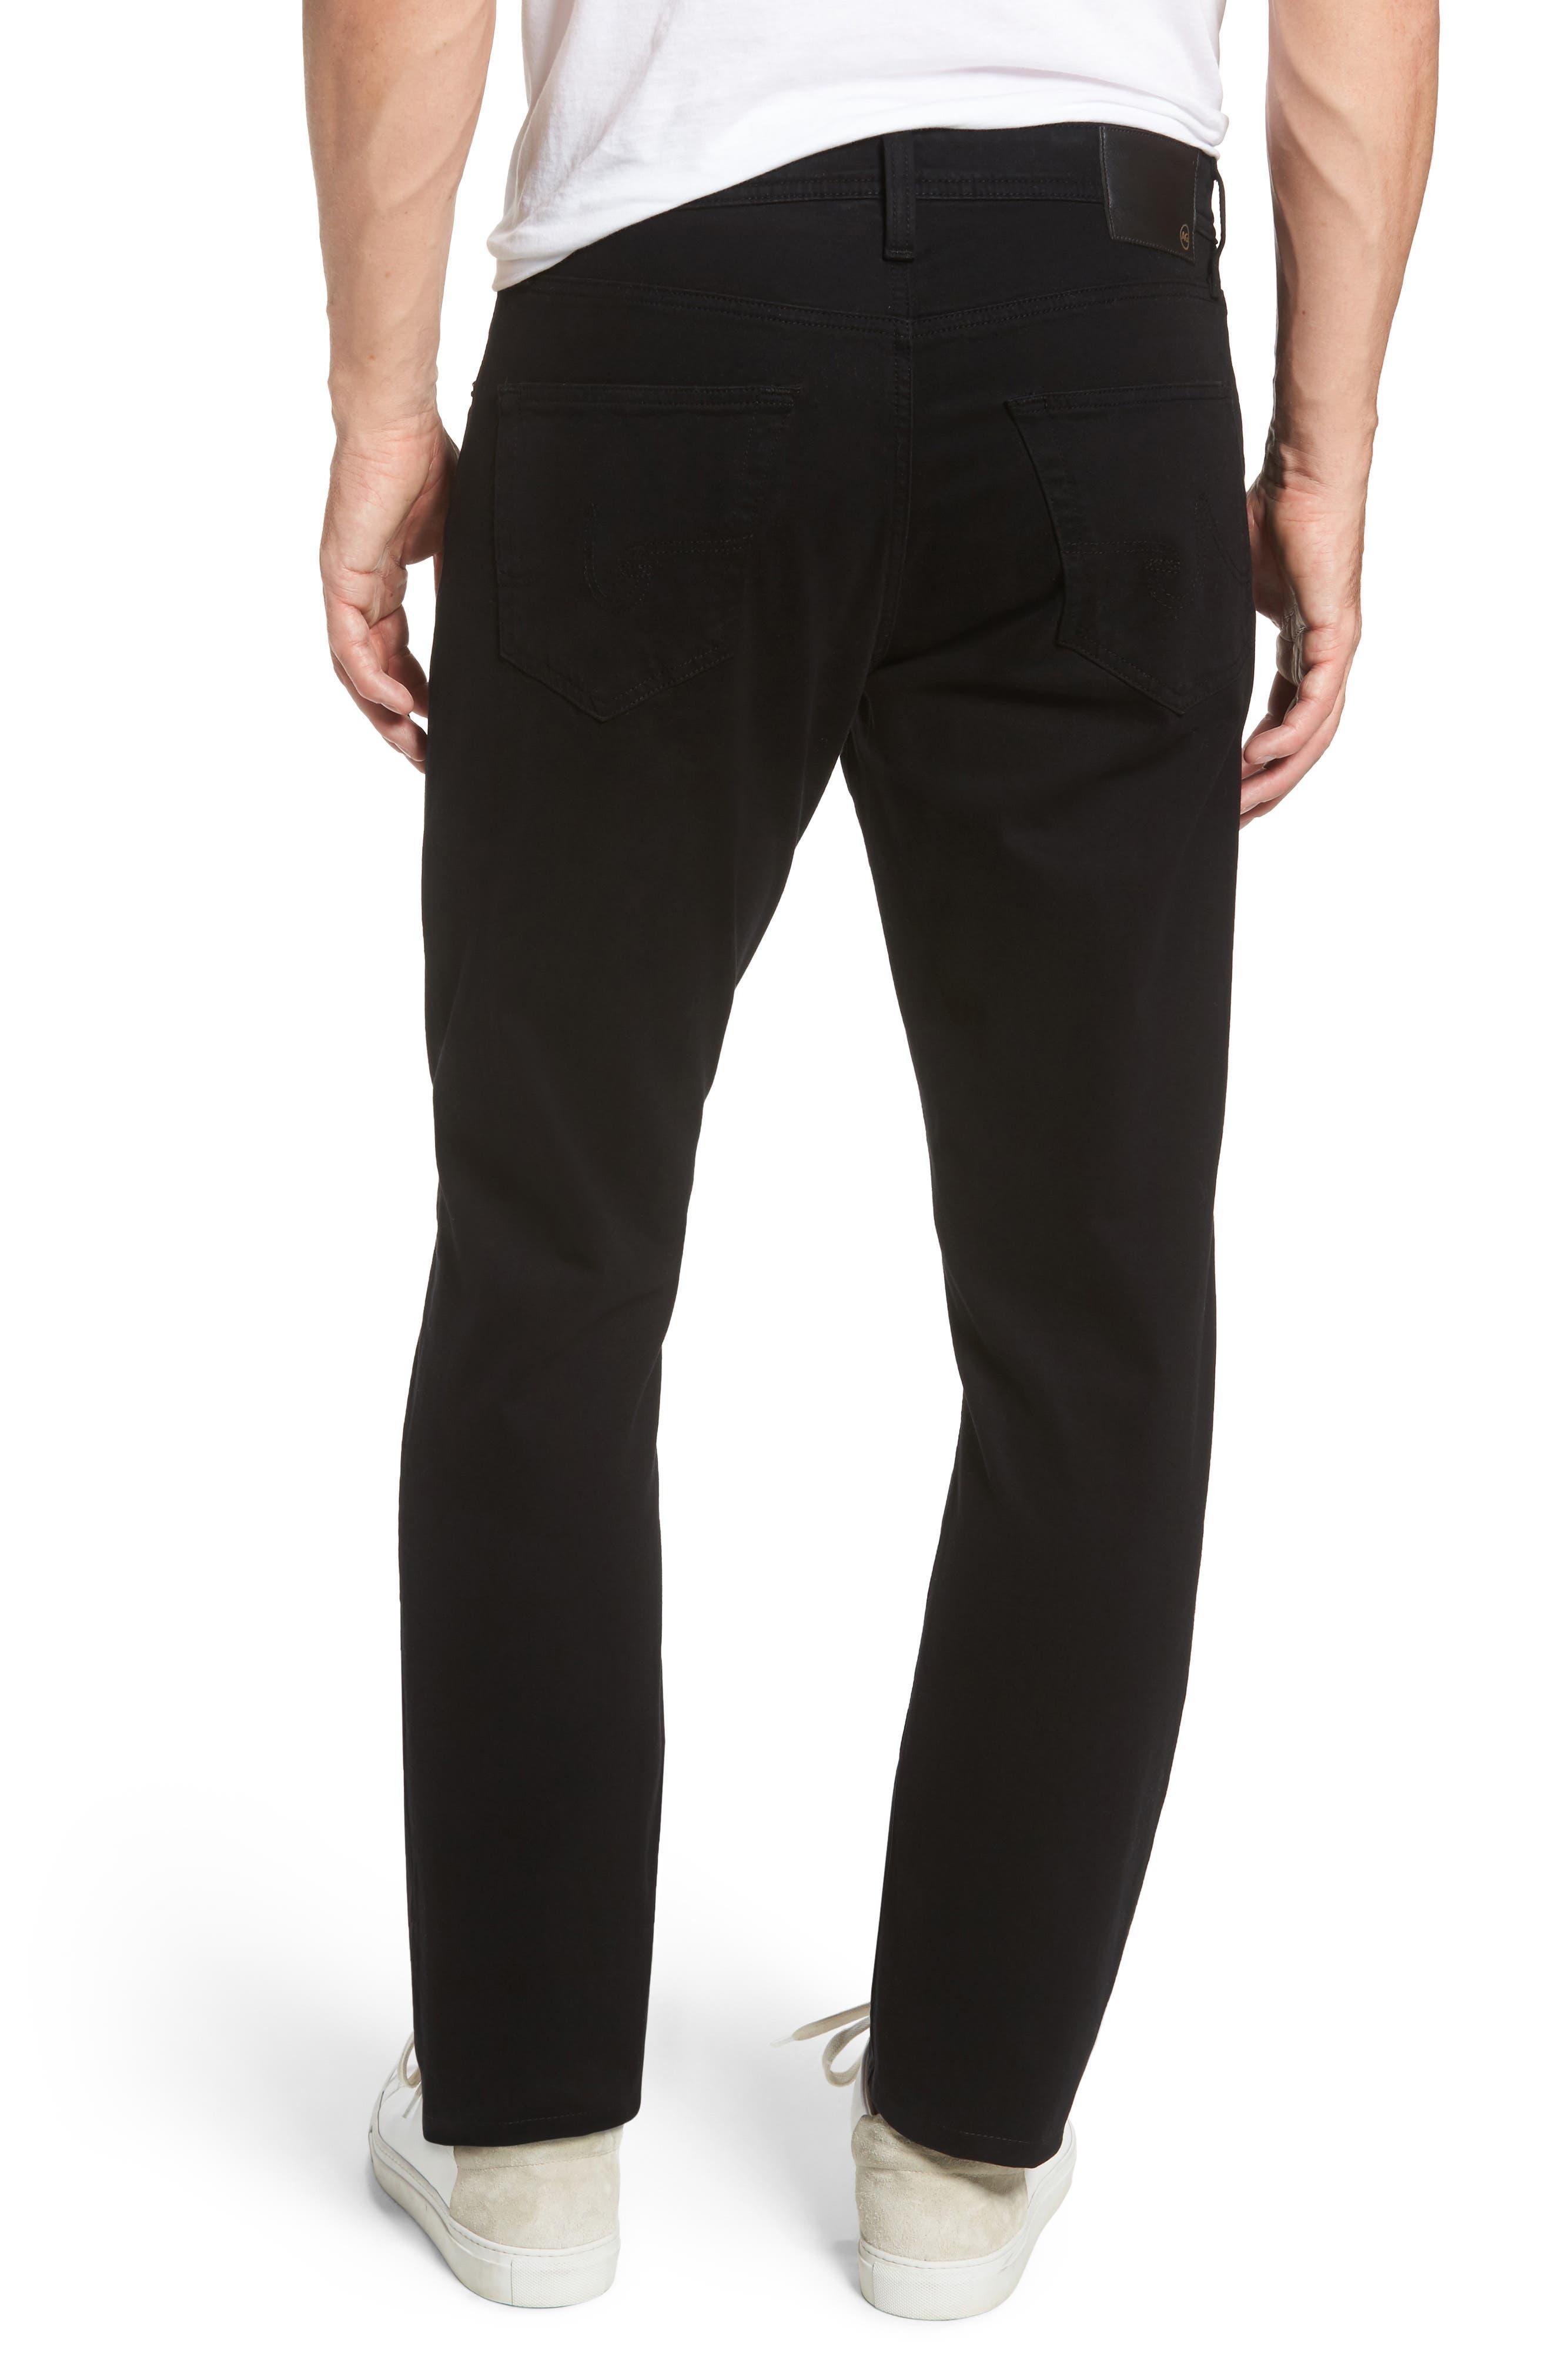 AG, Ives SUD Straight Leg Pants, Alternate thumbnail 2, color, 010